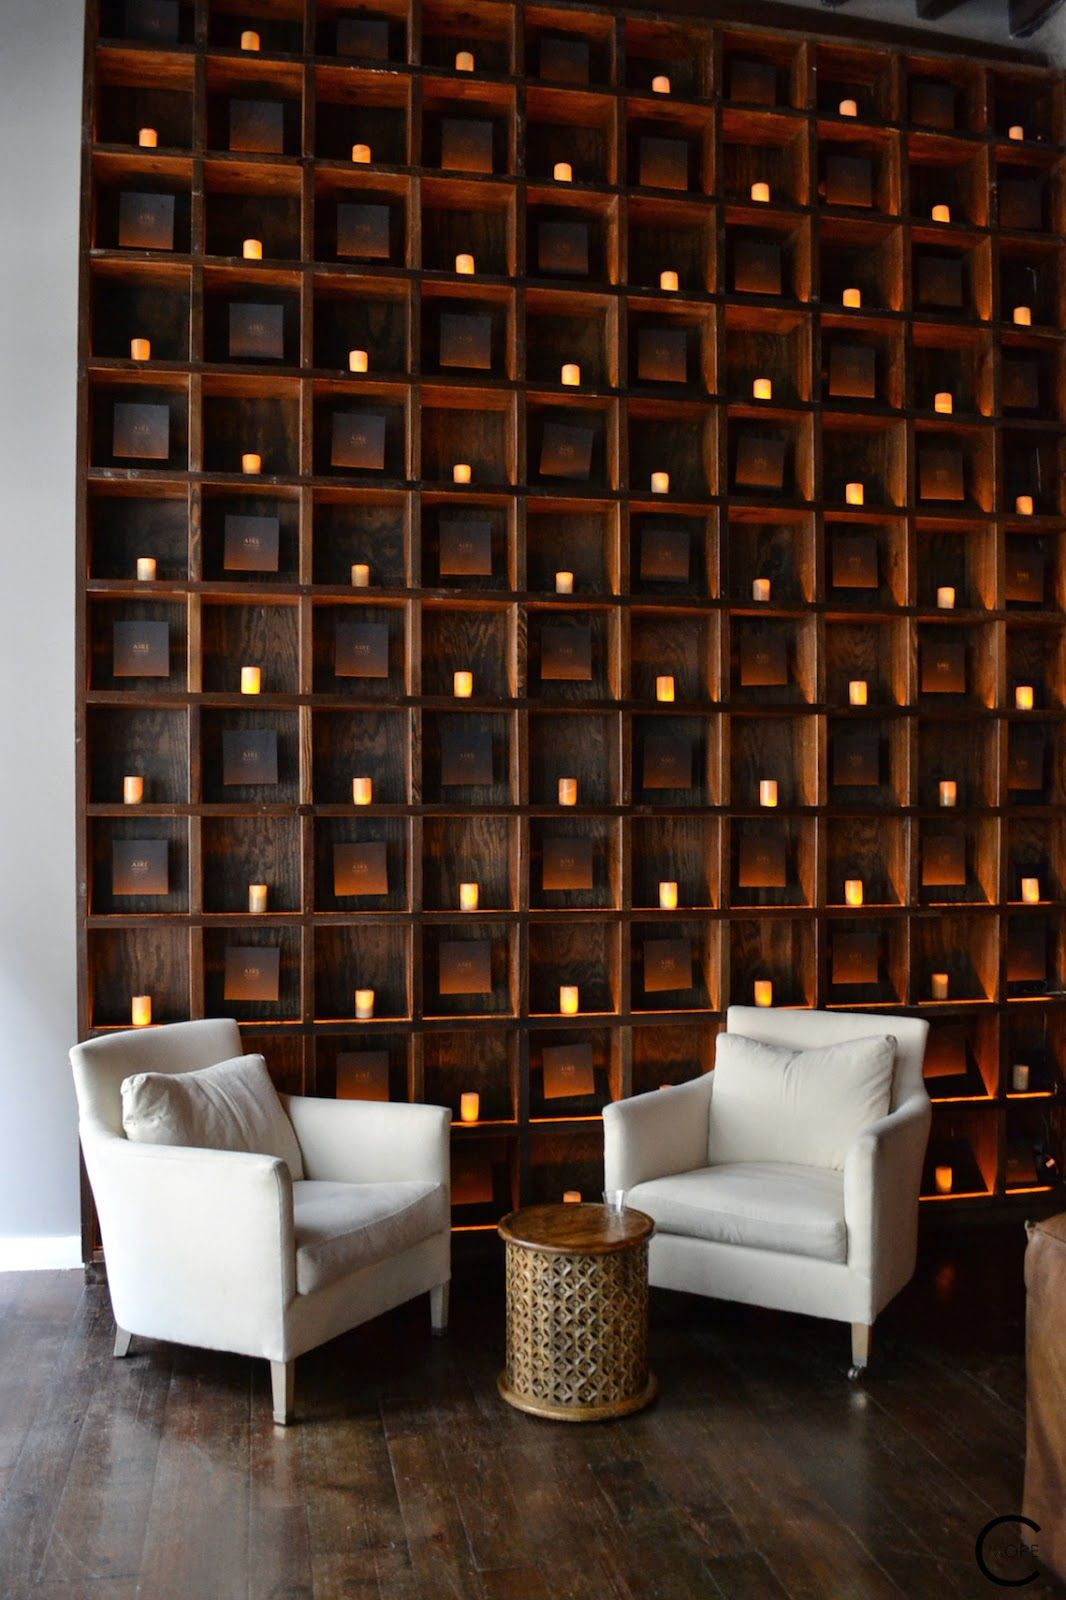 Spa | AIRE SOHO NYC | BlogtourNYC | MR.STEAM | By C More Interior Design  Blog | Interieuradvies Blog